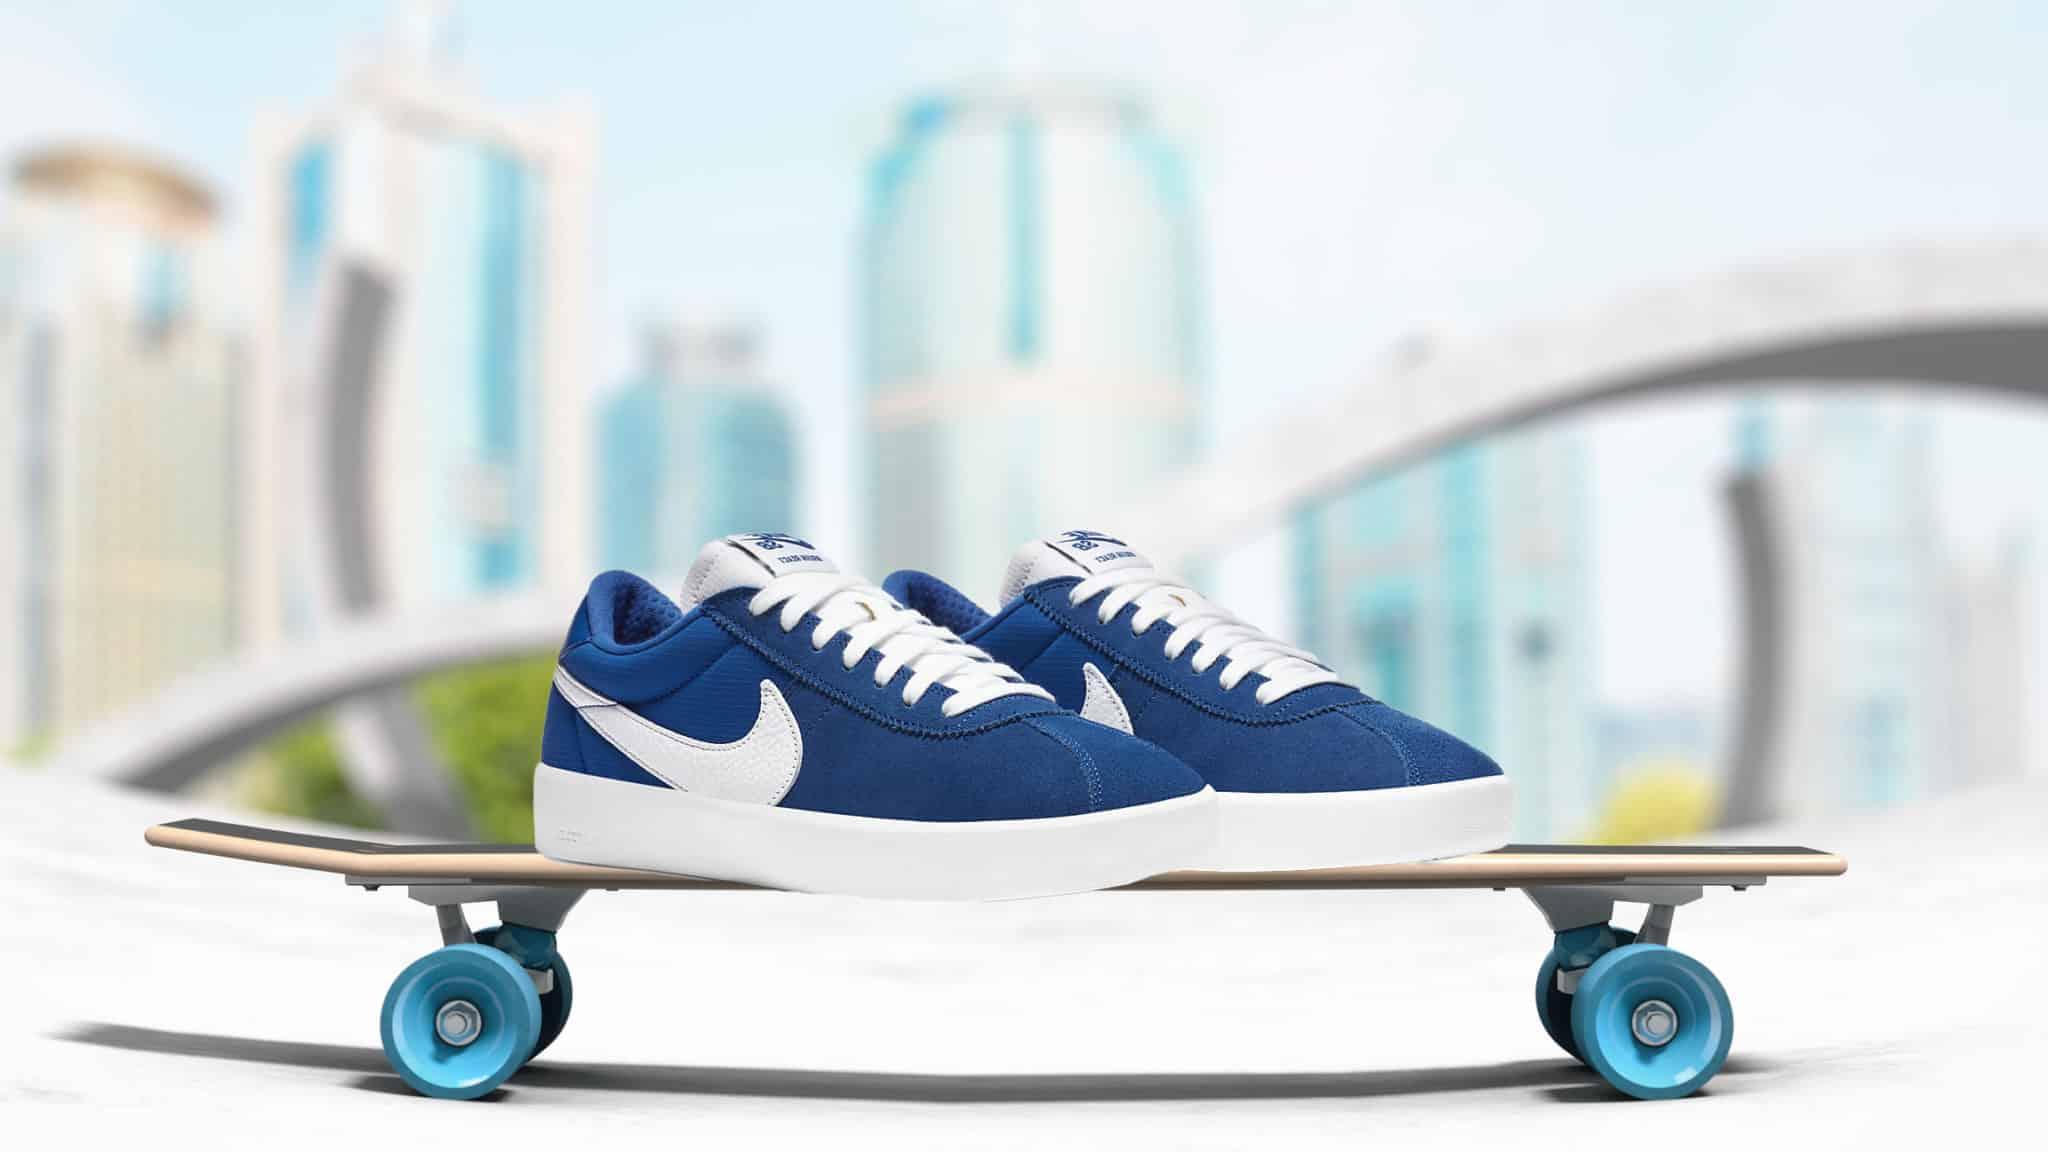 Nike Sb Bruin React Skate Shoe Team Royal